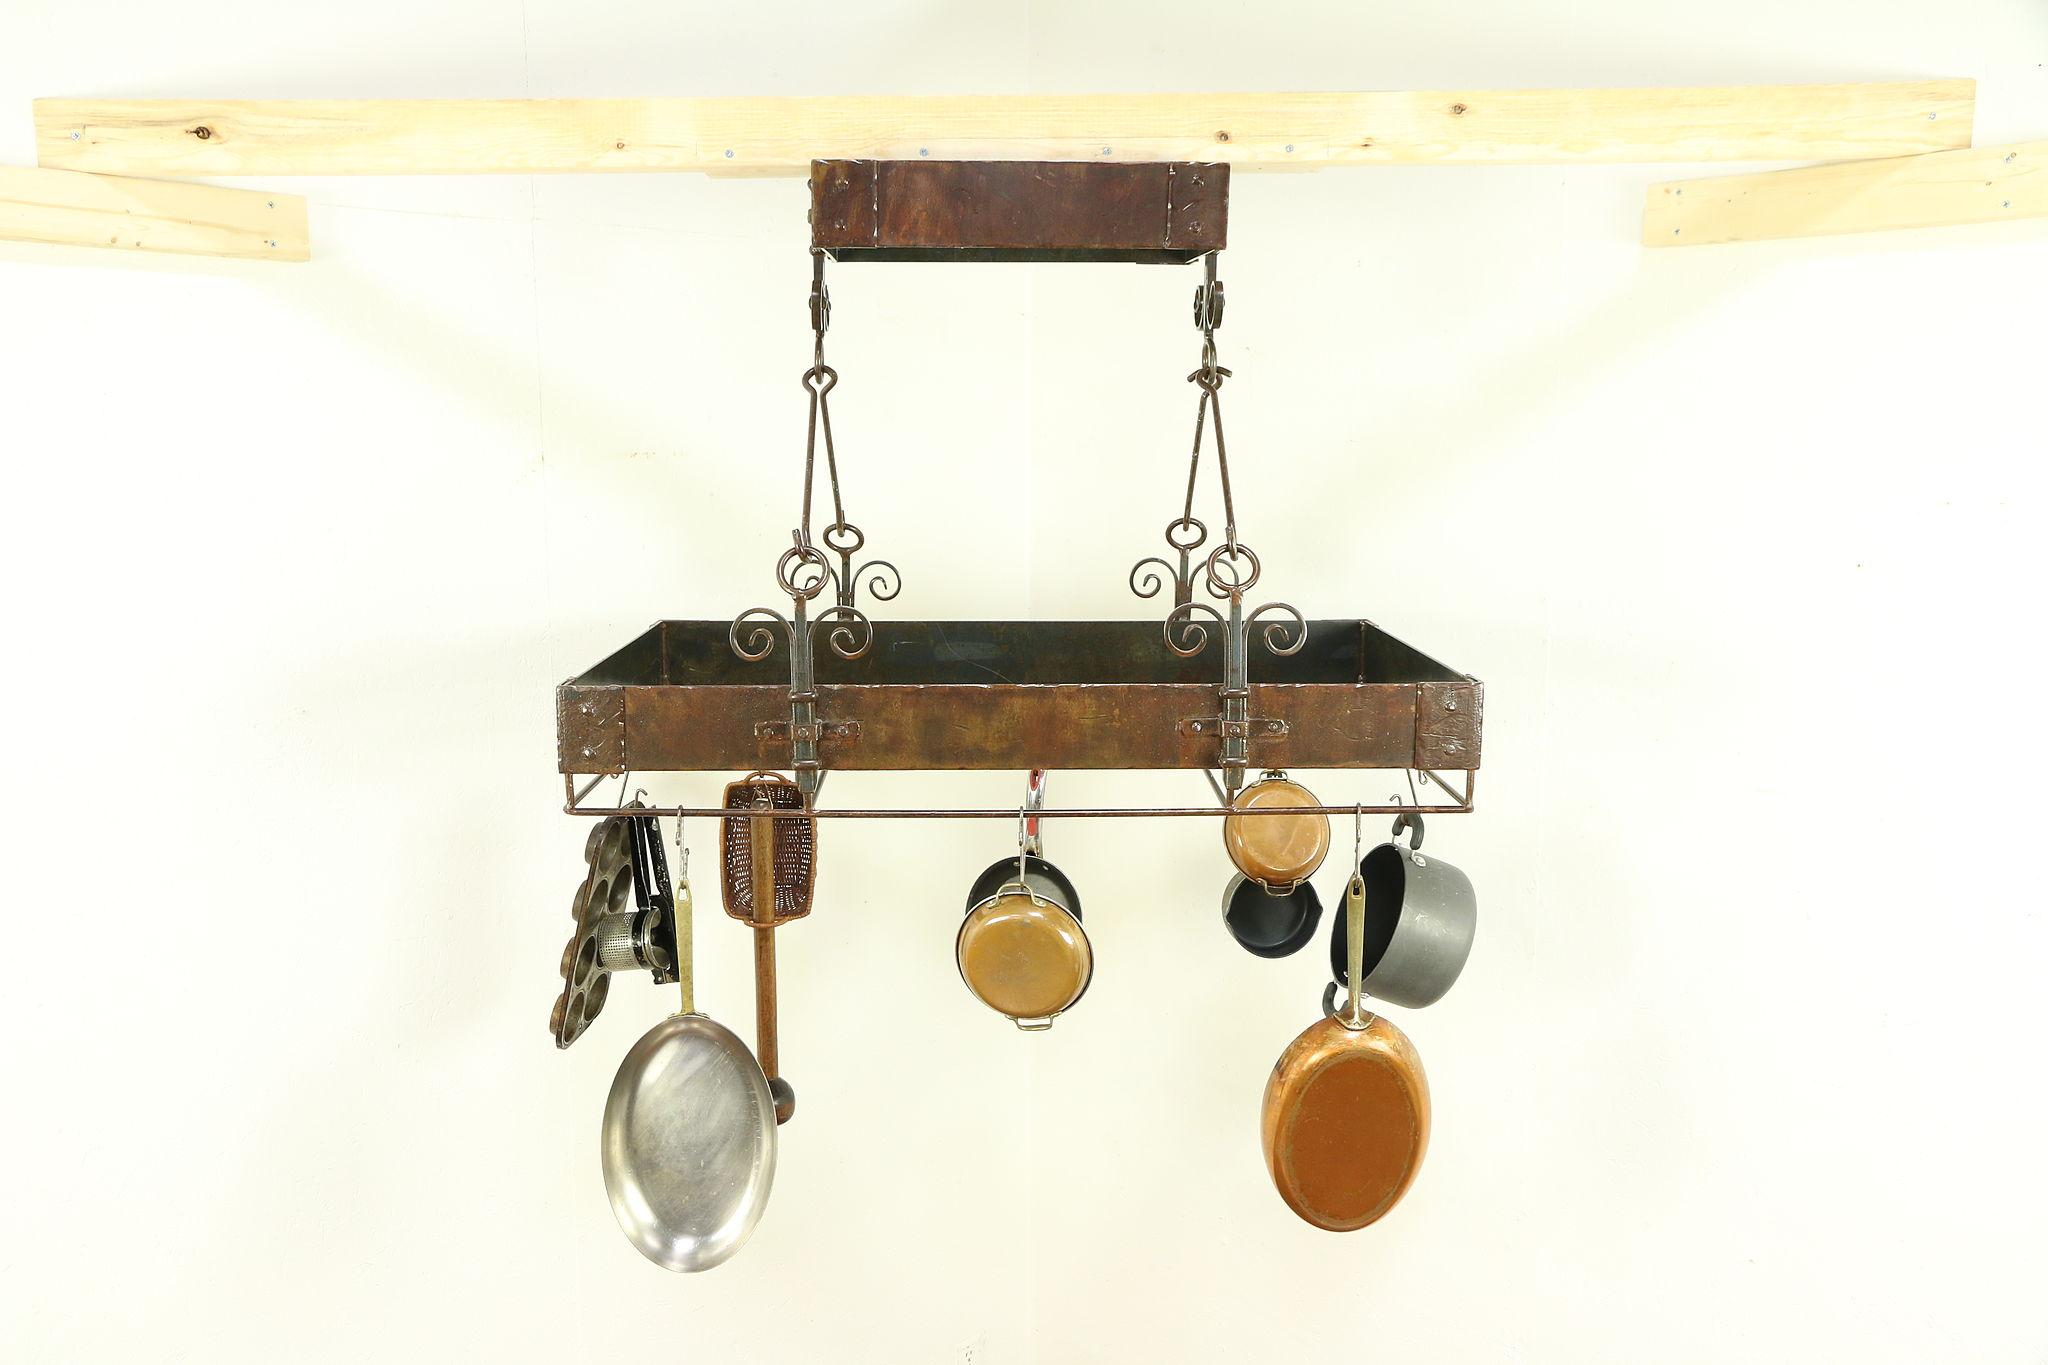 Wrought Iron Kitchen Hanging Pot Rack, Bronze Finish #30305